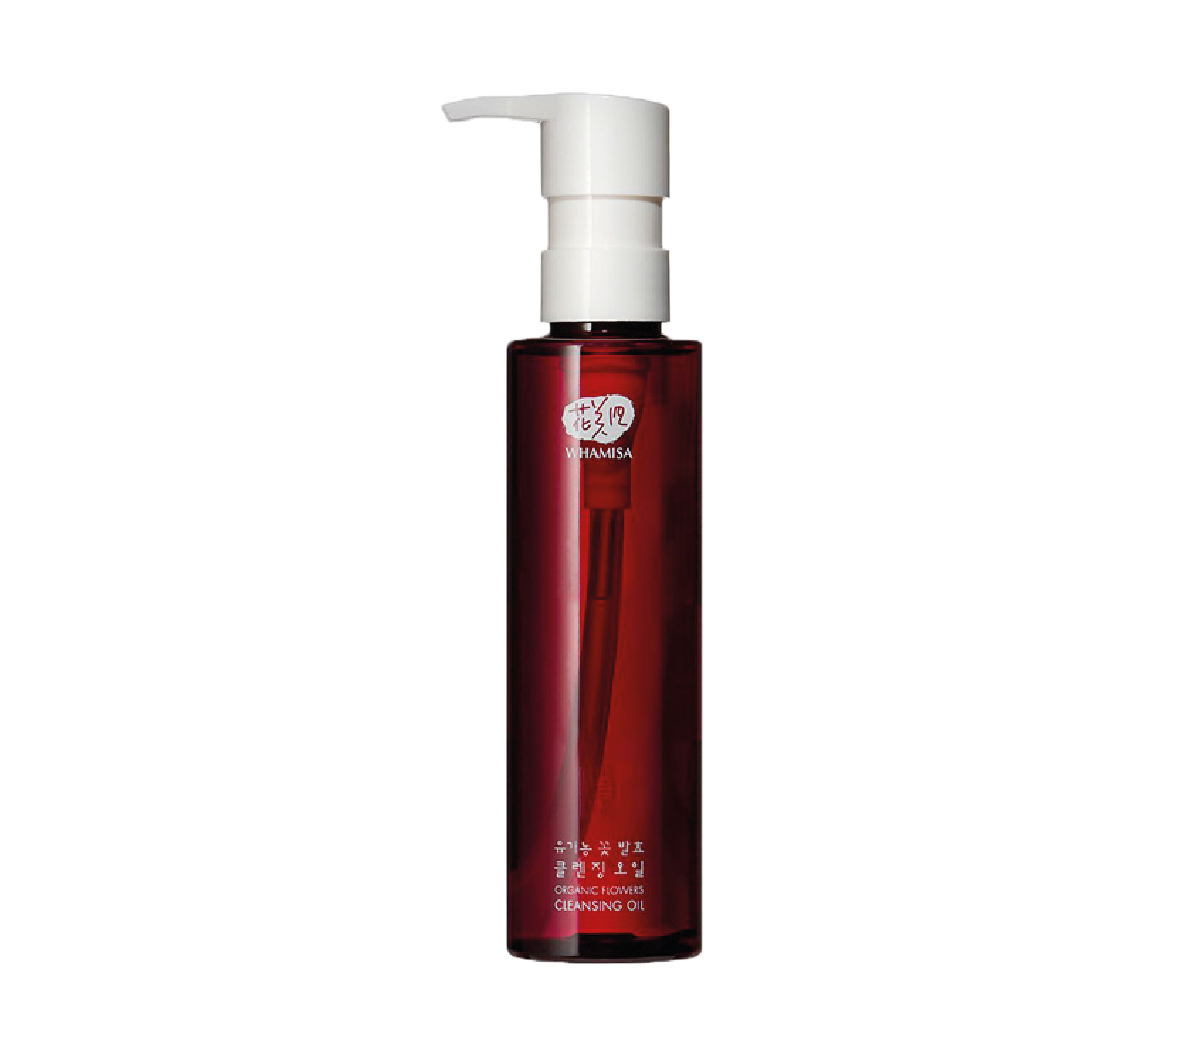 WHAMISA-Organic-Flowers-Cleansing-Oil-Bio-Vegan-bottle